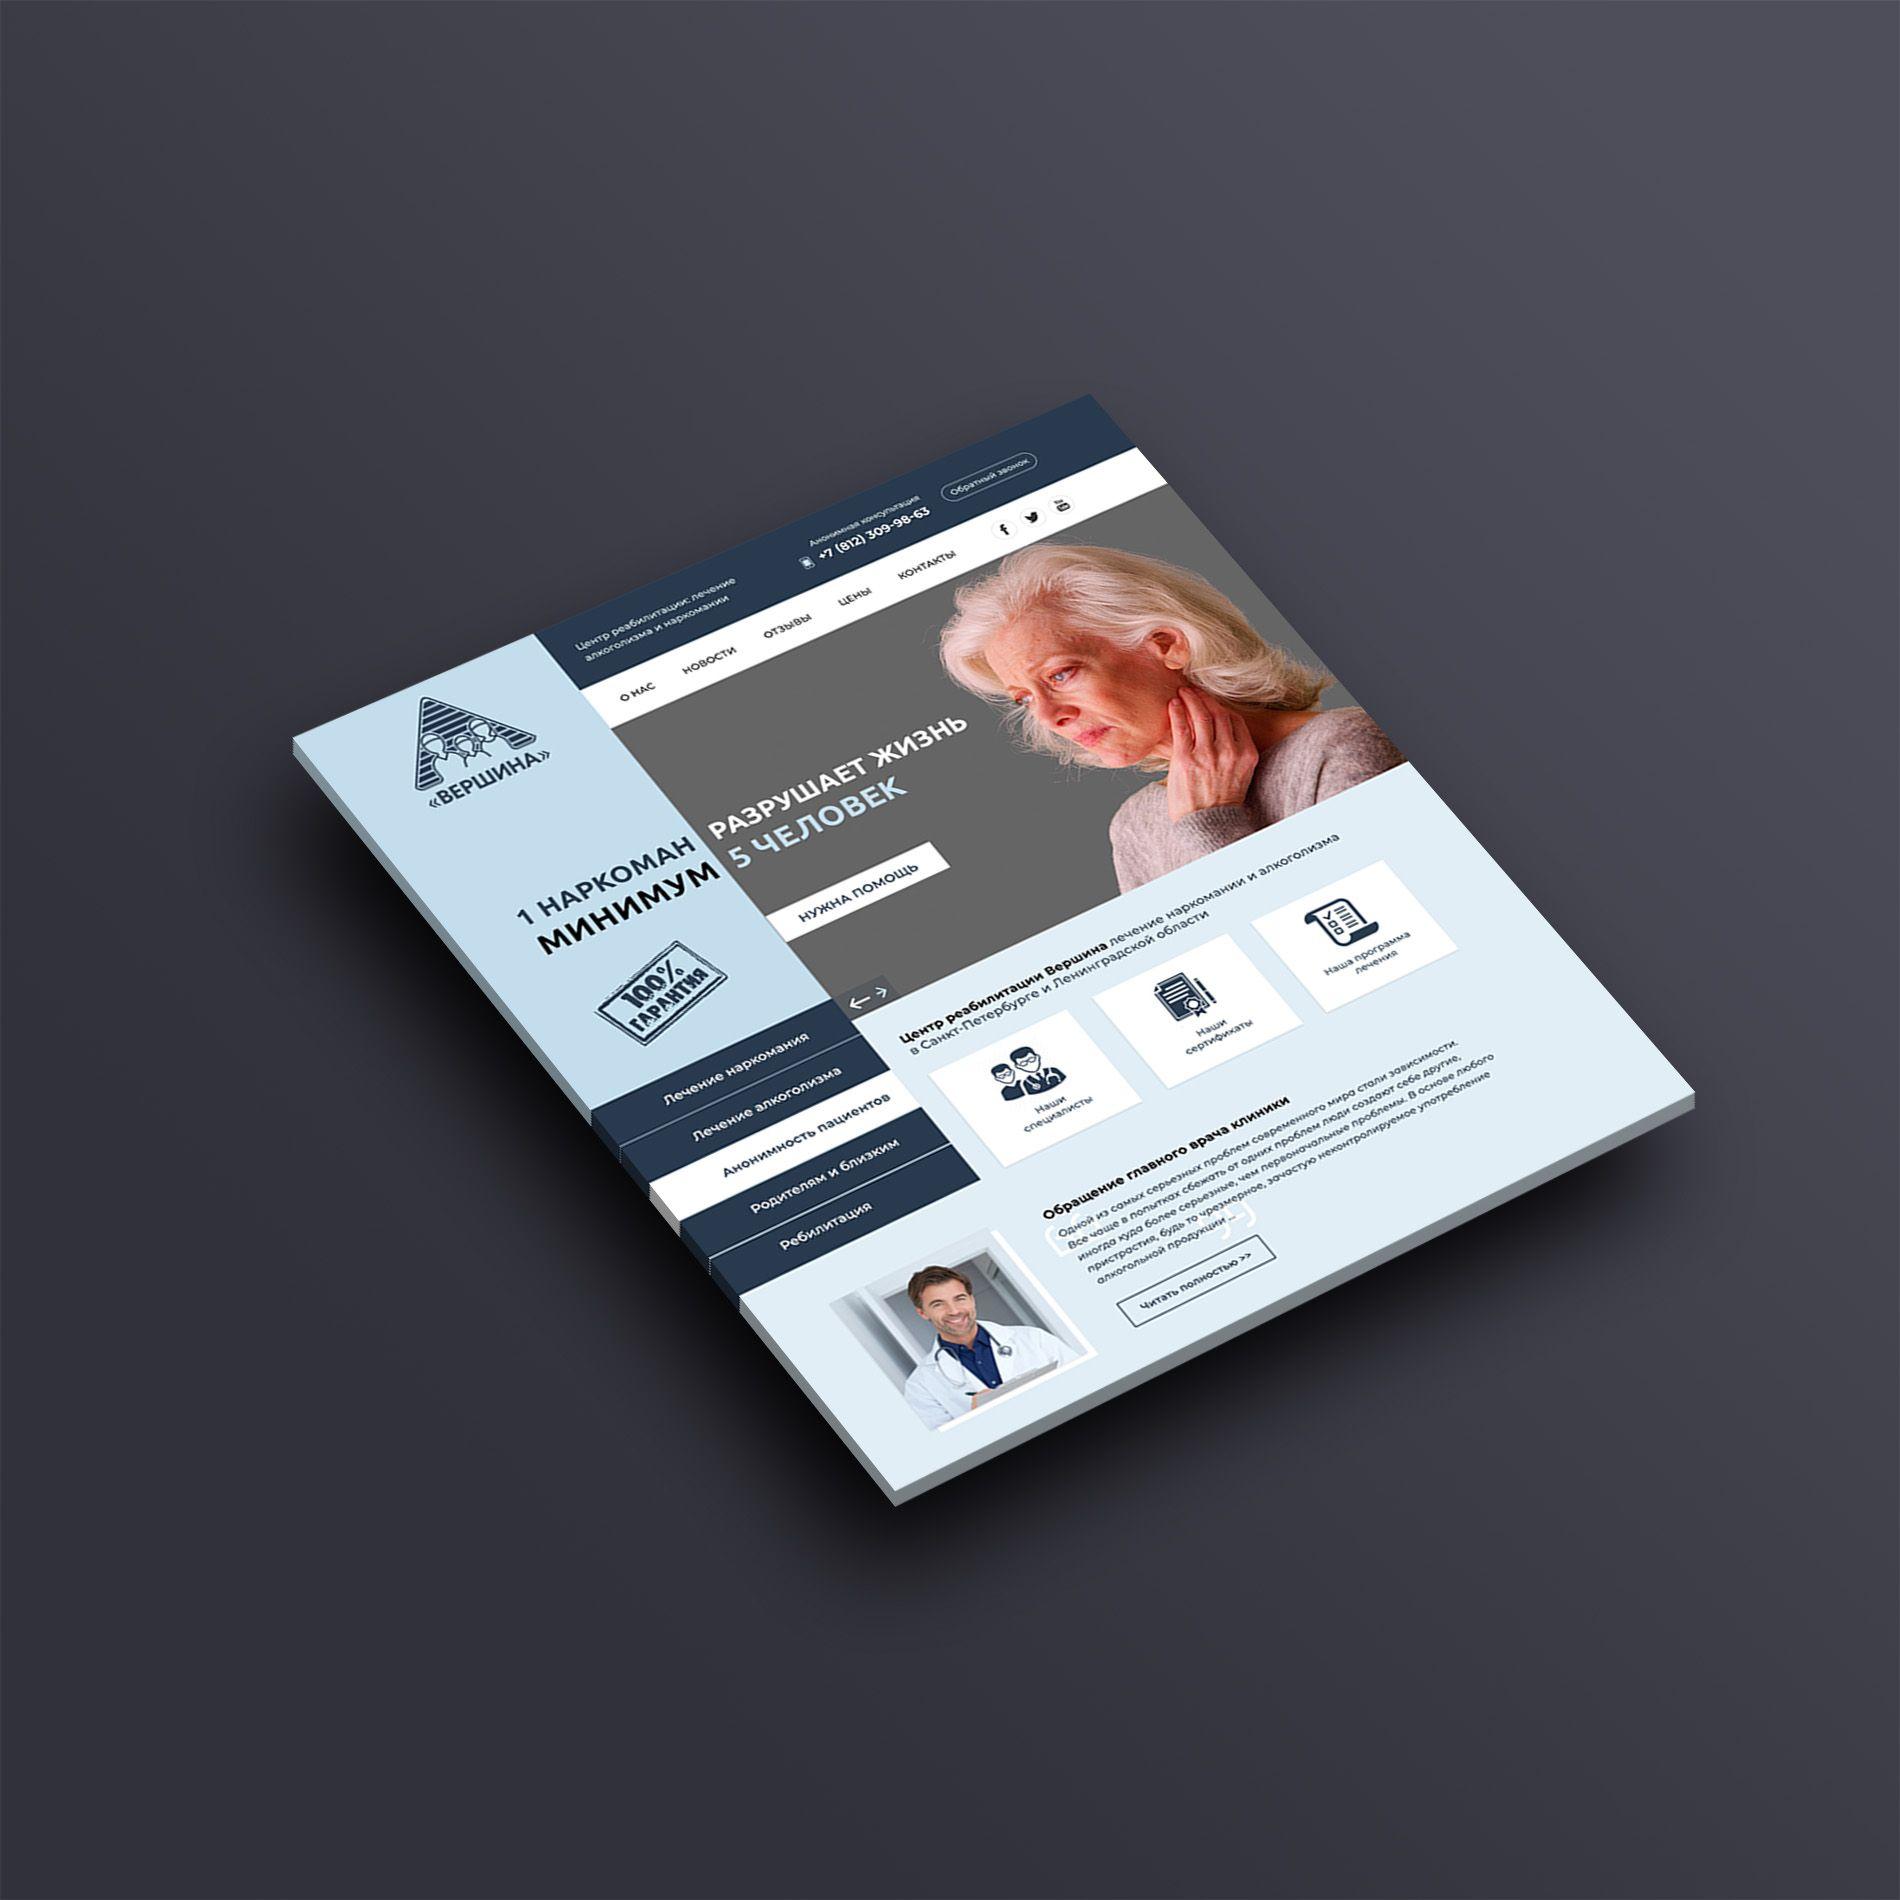 Веб-сайт для http://vershina-spb.ru/ - дизайнер mia2mia